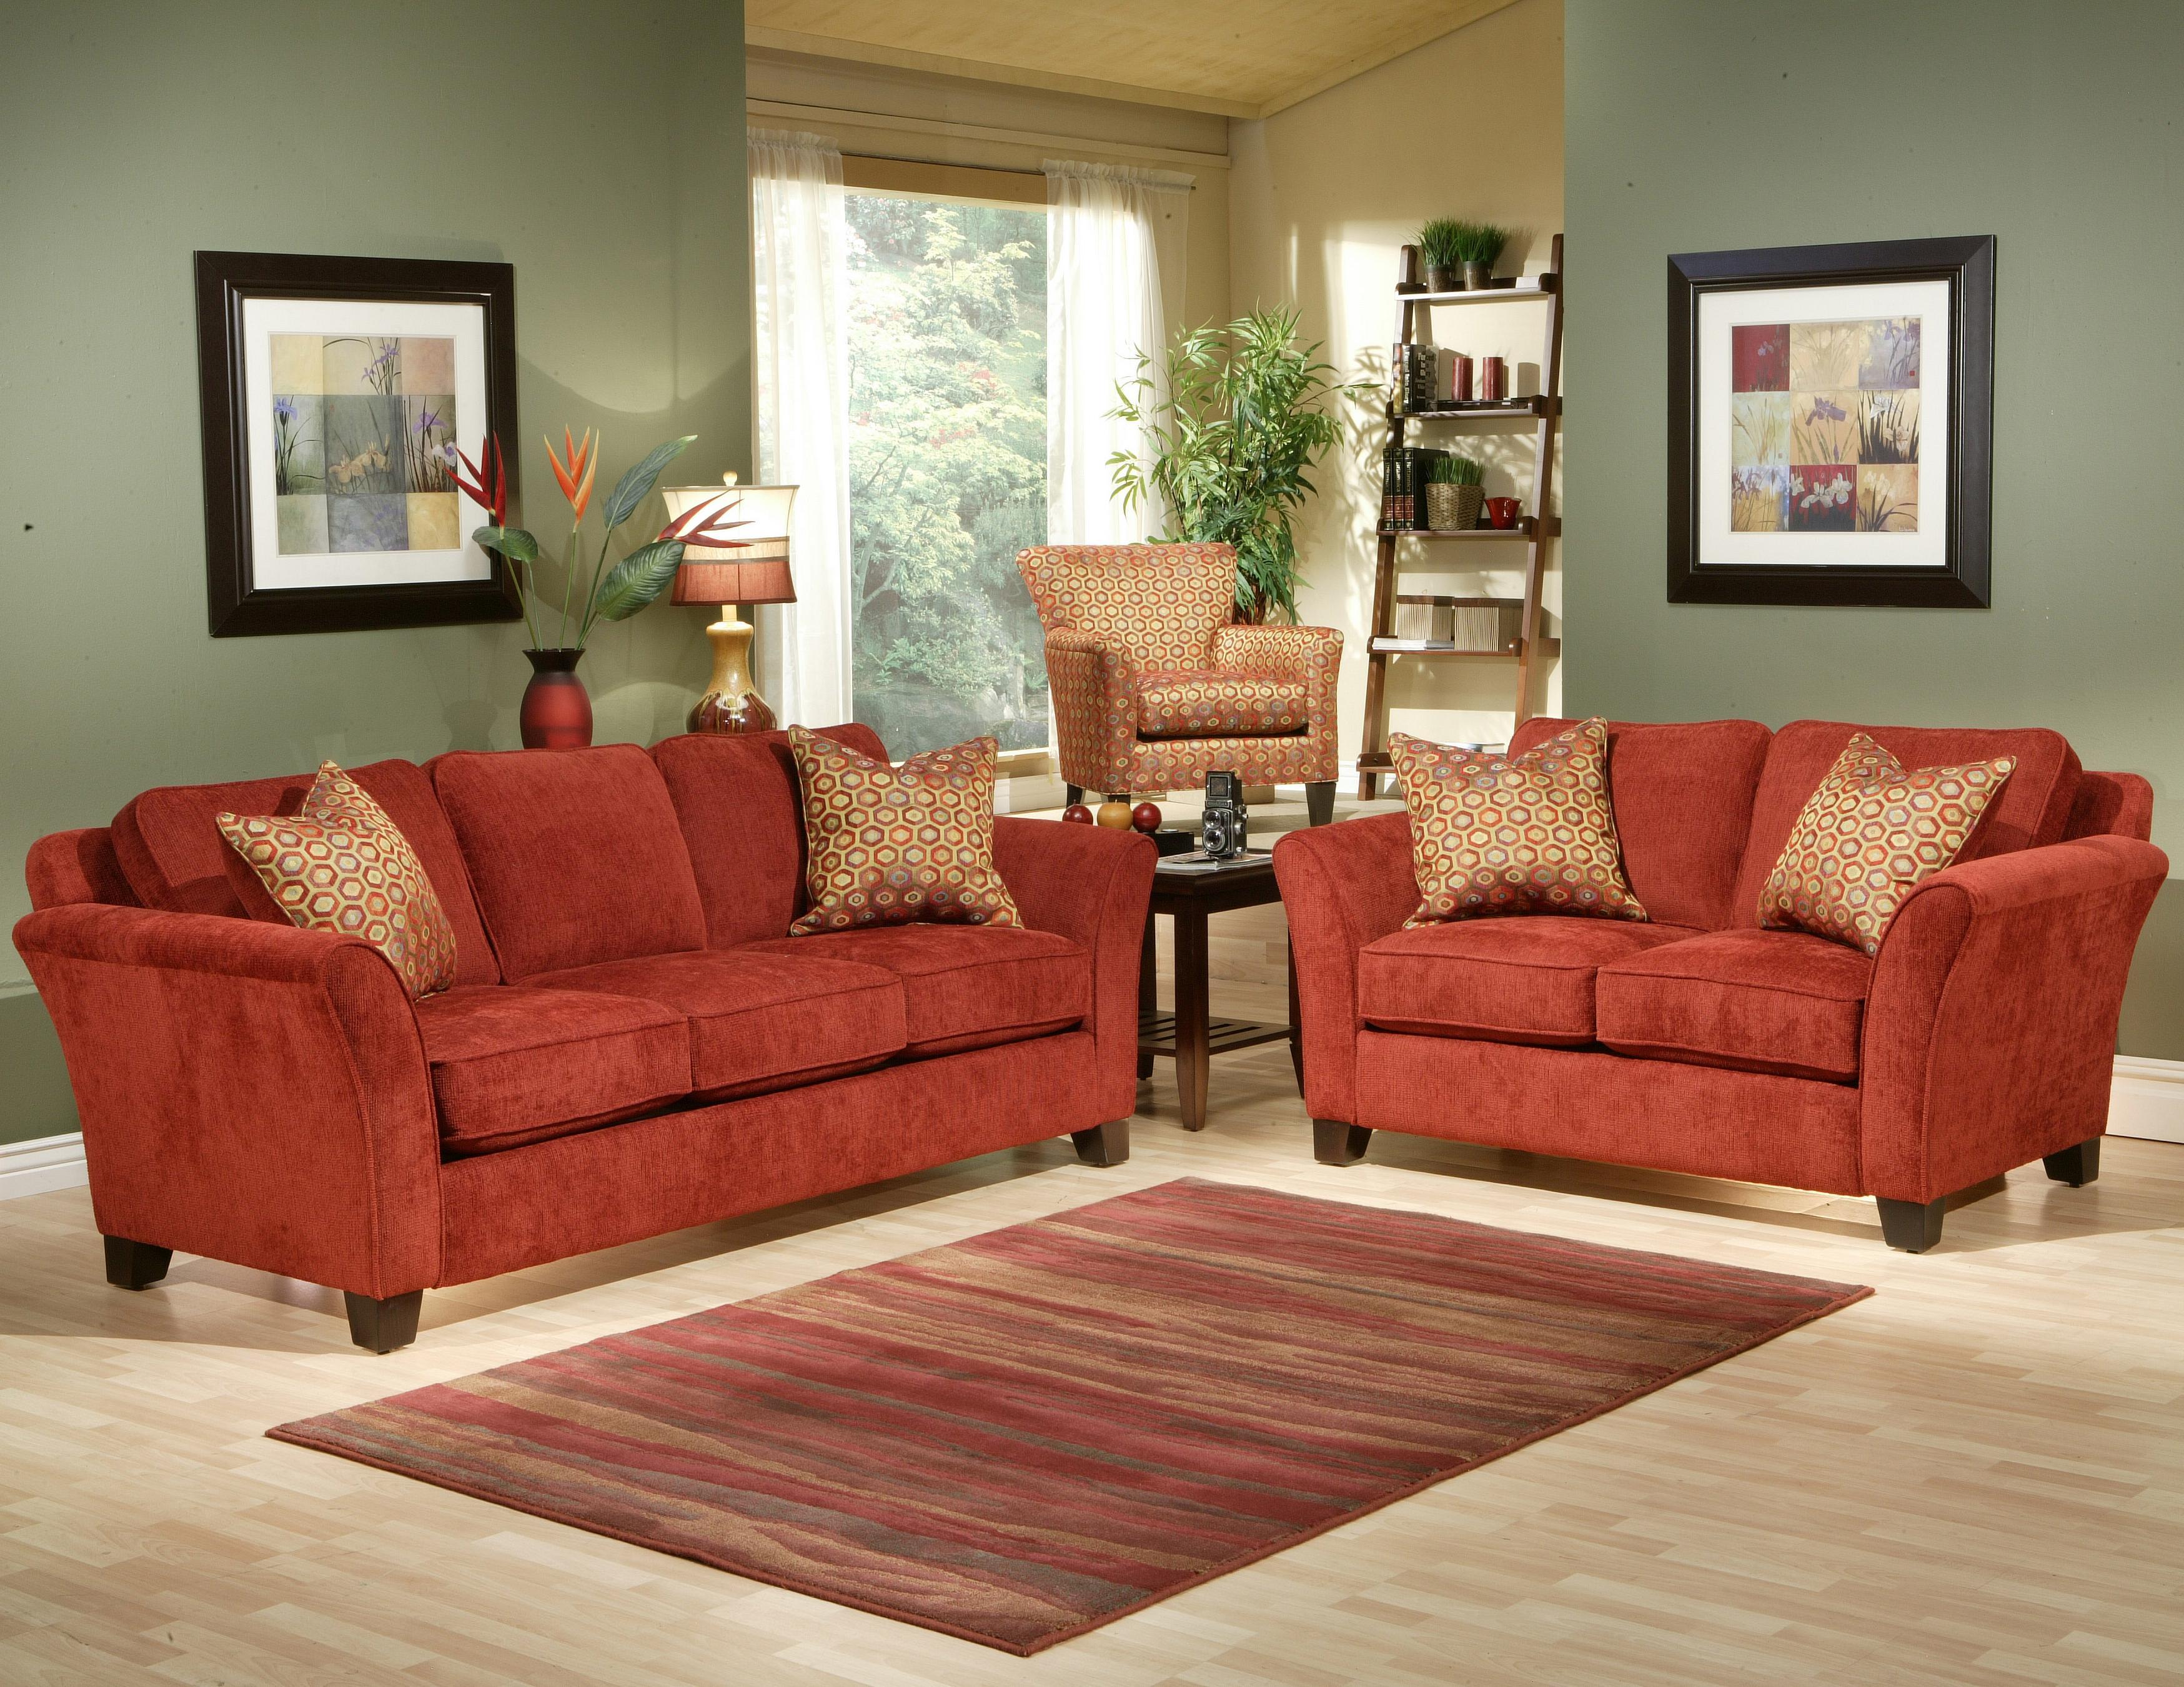 michael blog simplifying nyc cupboard furniture robert lucite design fabulous ambella finishes interior